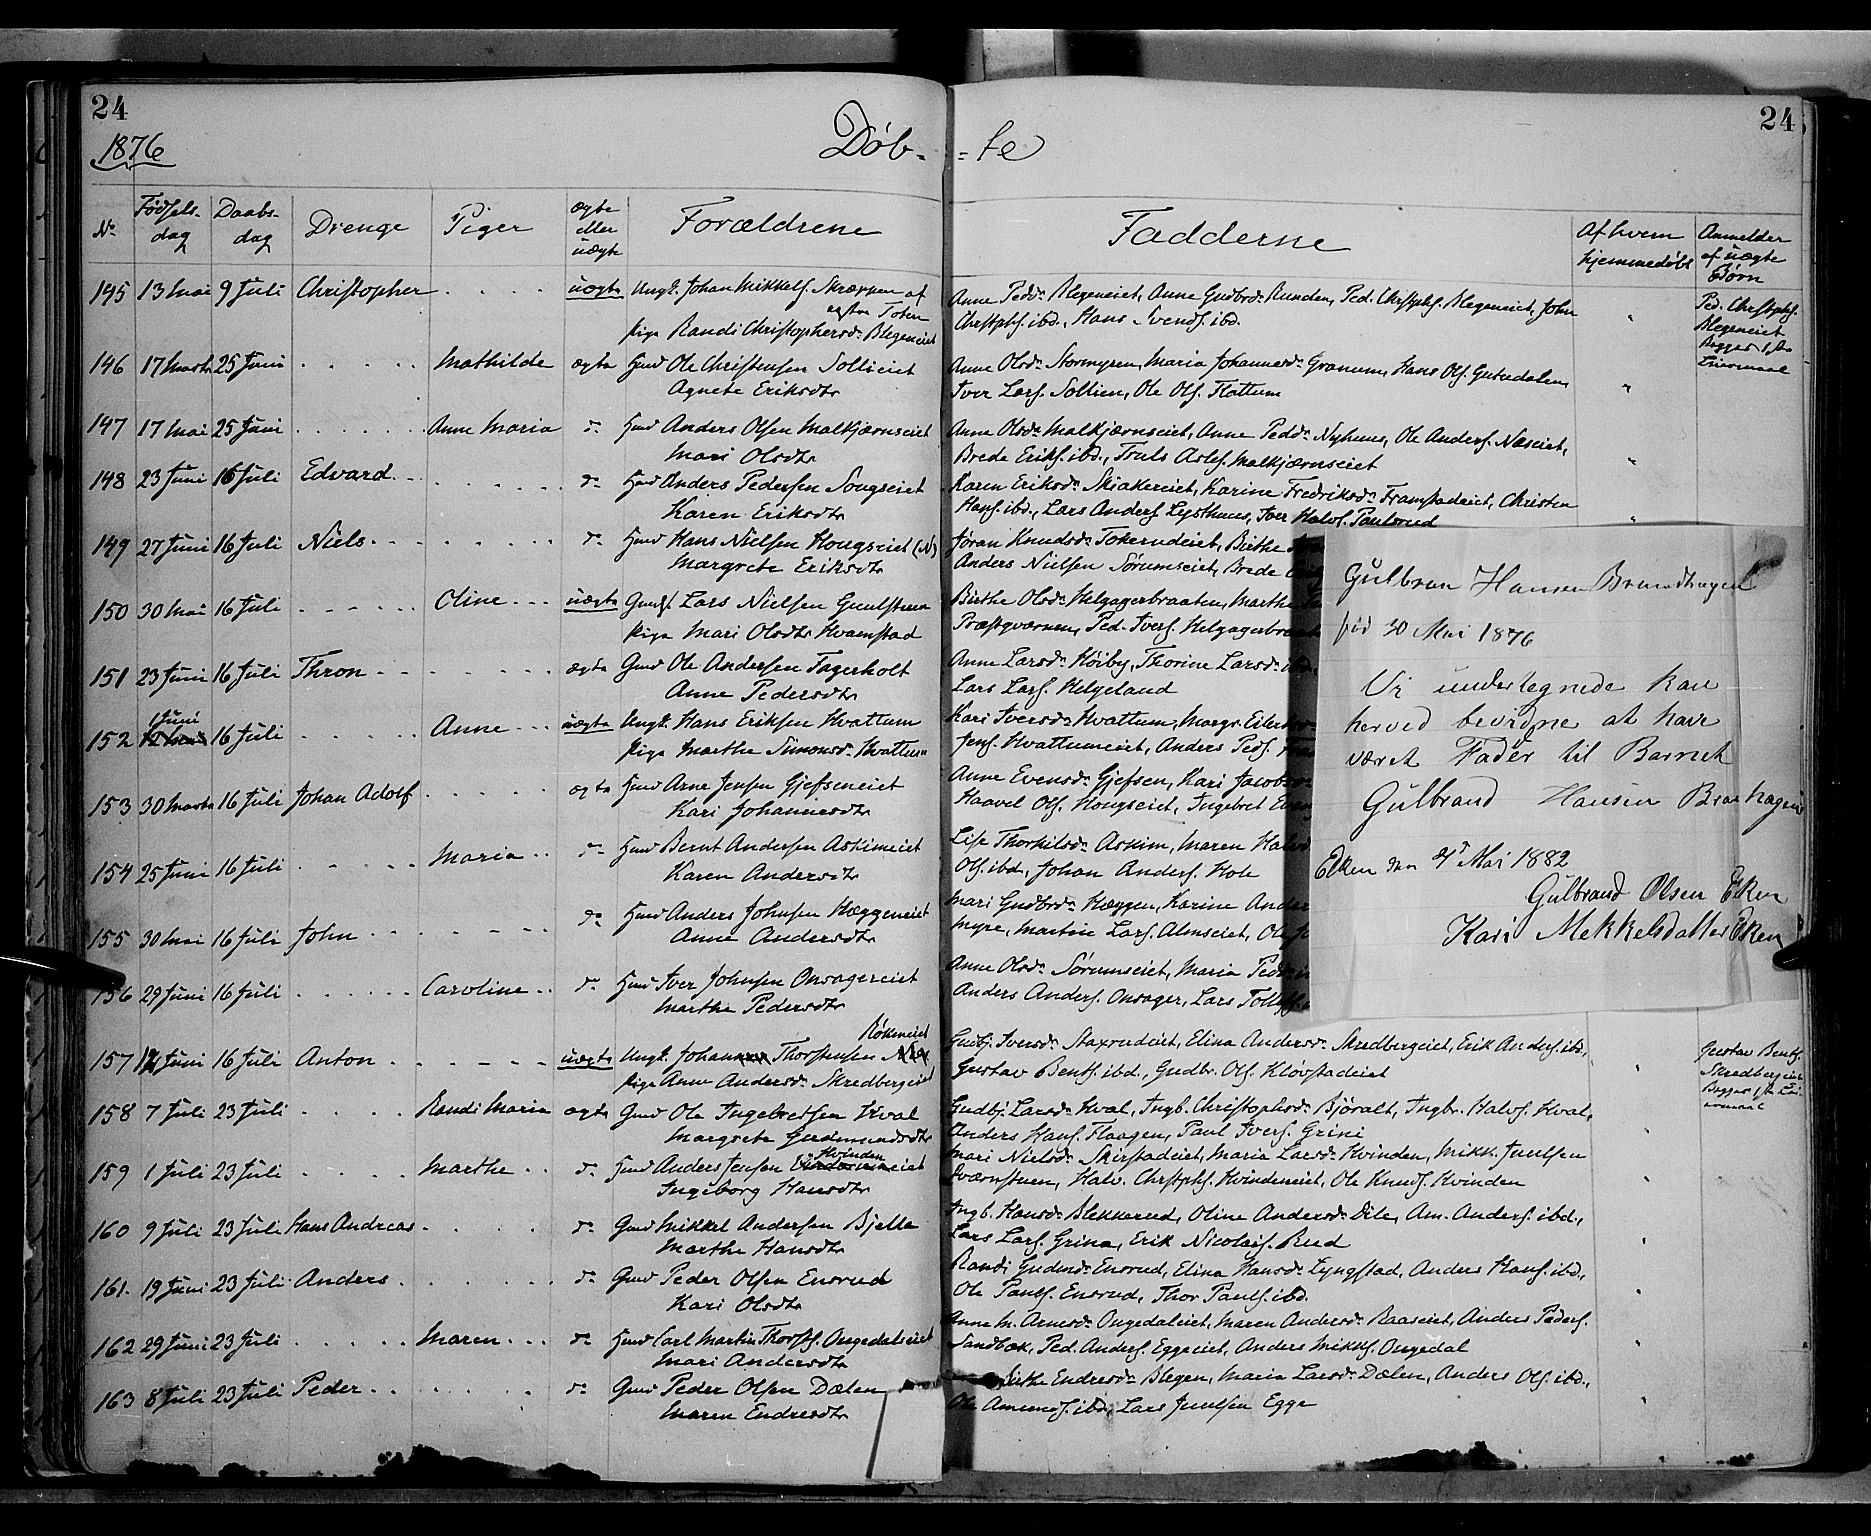 SAH, Gran prestekontor, Ministerialbok nr. 13, 1875-1879, s. 24